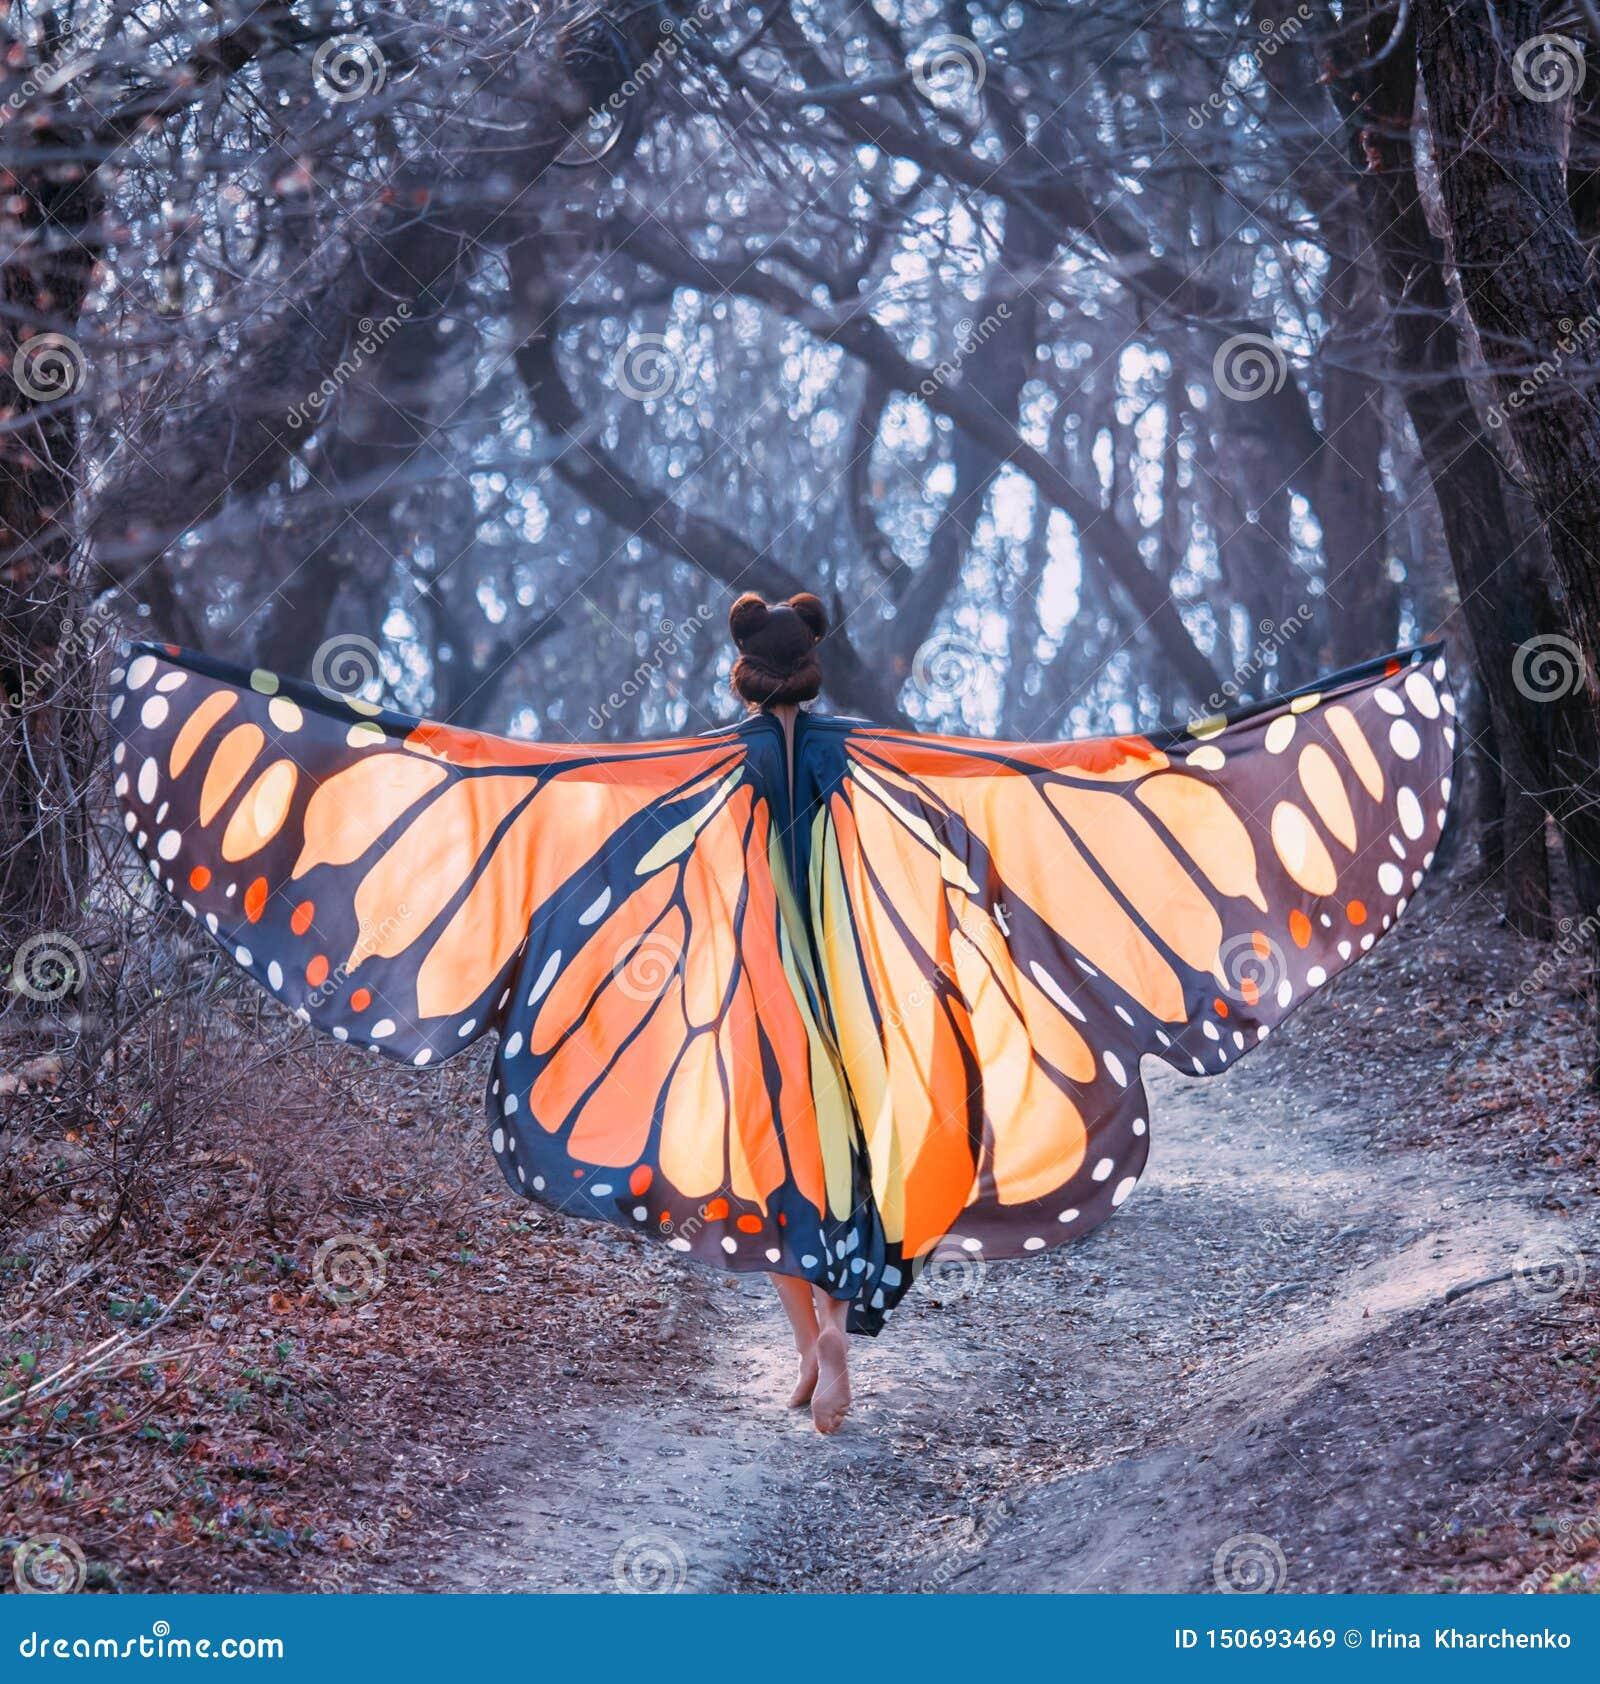 https://thumbs.dreamstime.com/z/fairy-tale-butterfly-mysterious-story-girl-red-hair-big-light-orange-wings-lady-walks-barefoot-along-fairy-tale-150693469.jpg